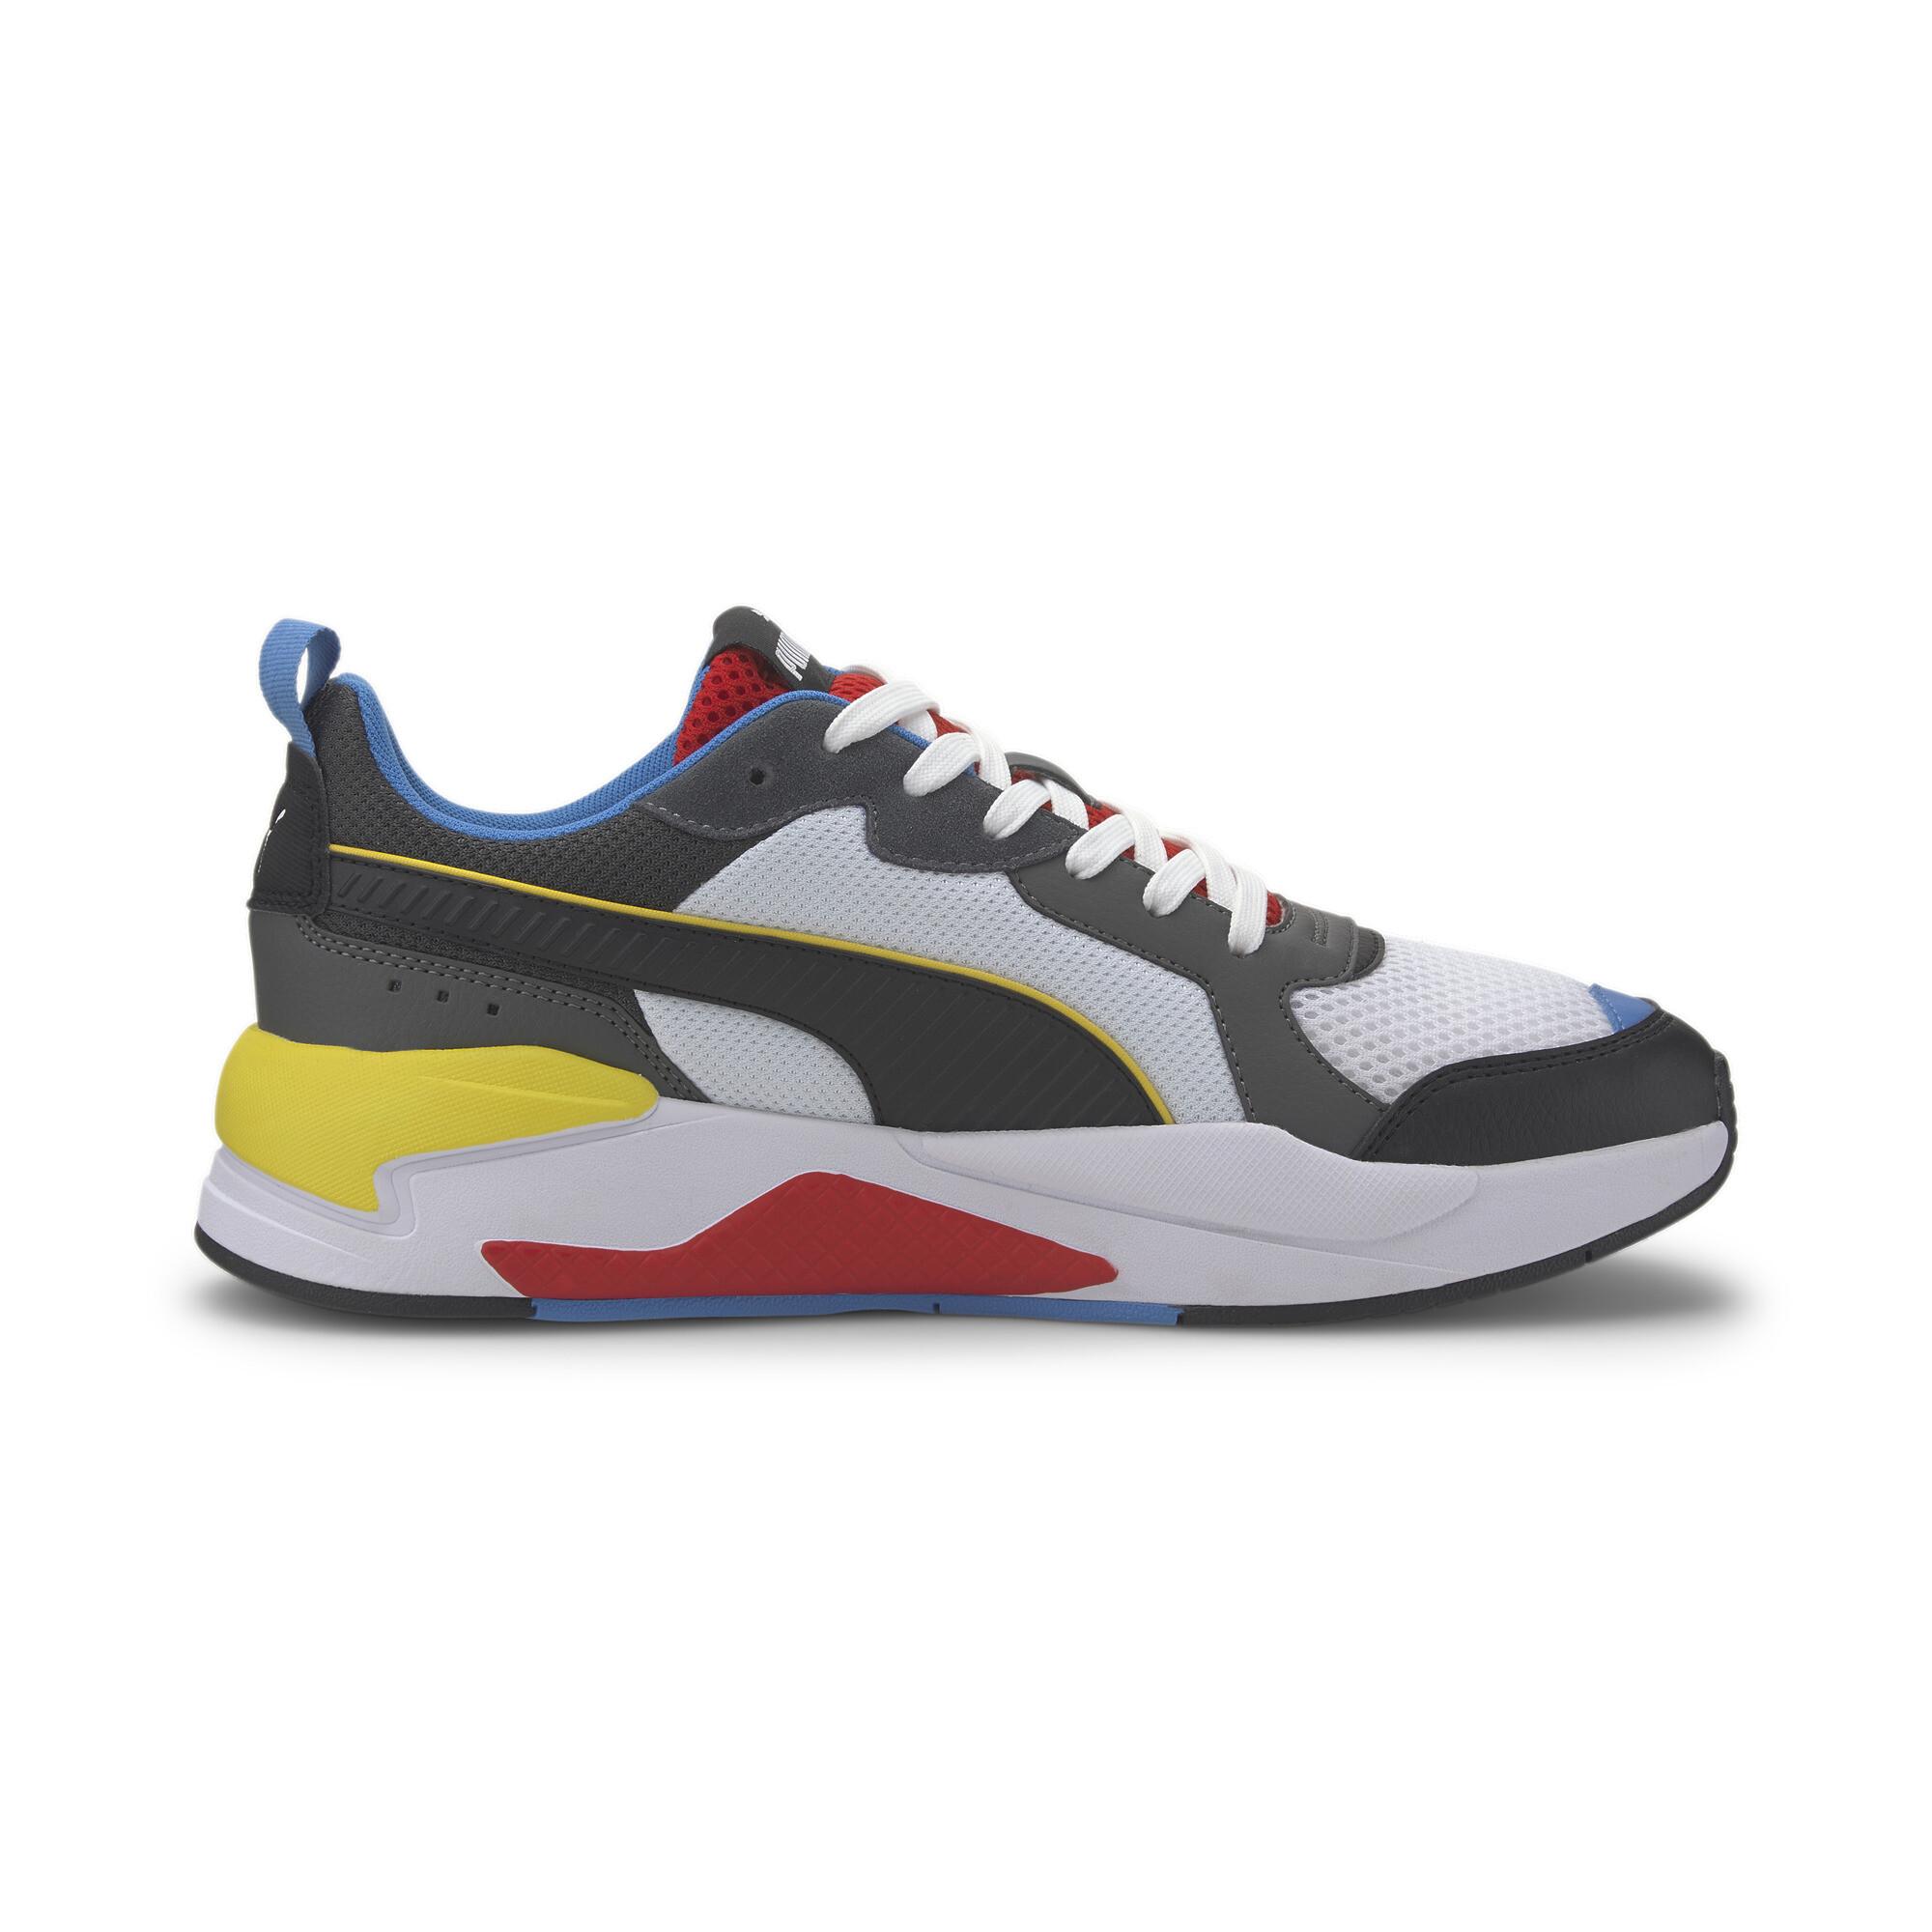 PUMA-Men-039-s-X-RAY-Sneakers thumbnail 7